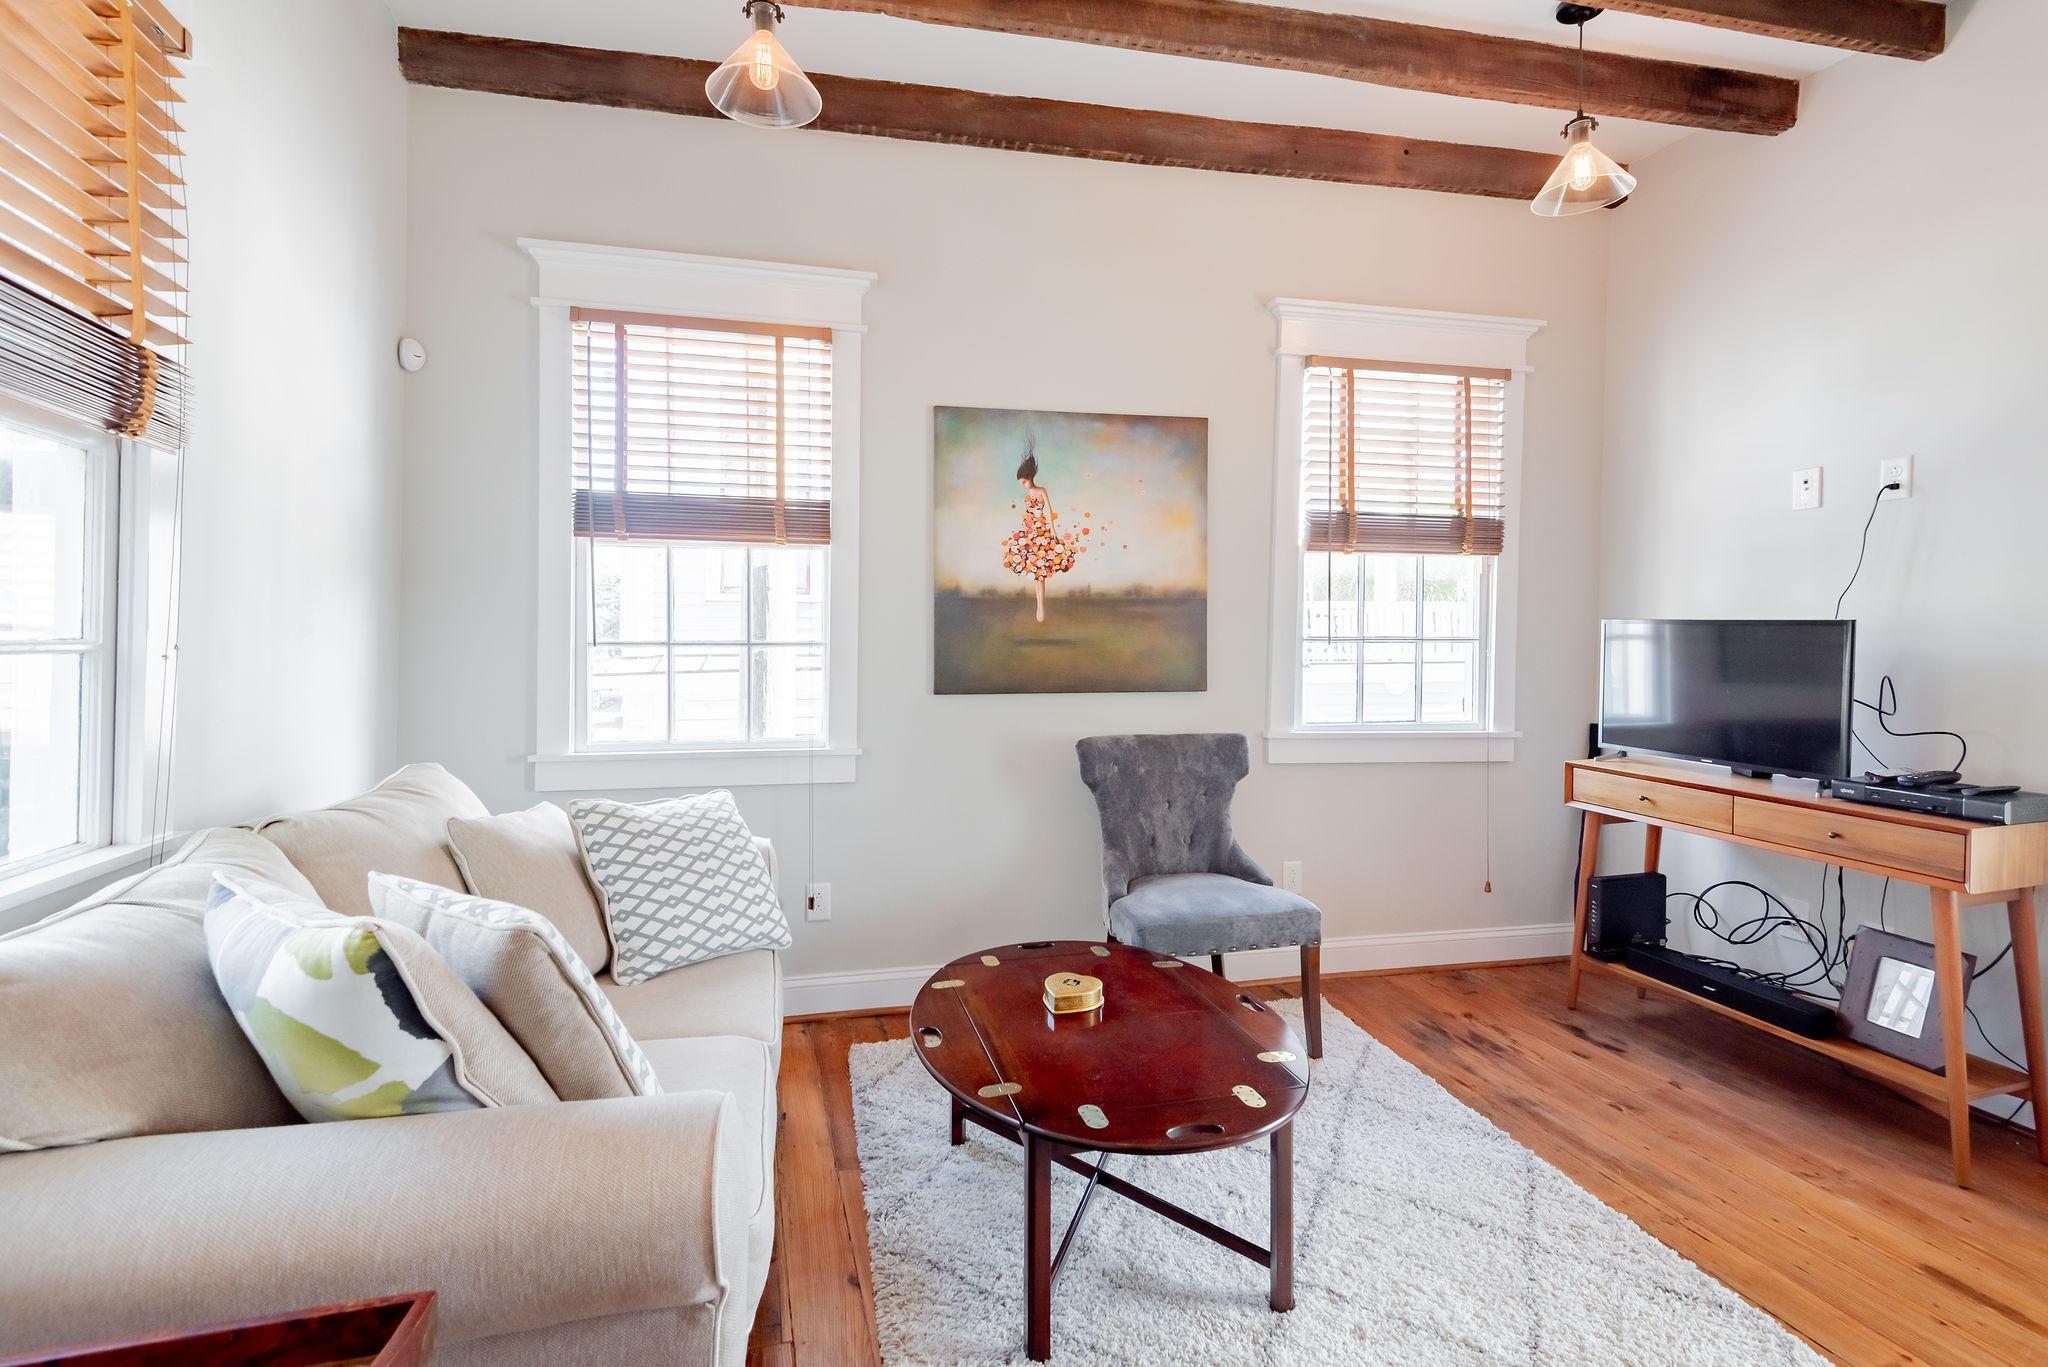 Elliotborough Homes For Sale - 29 Sires, Charleston, SC - 11